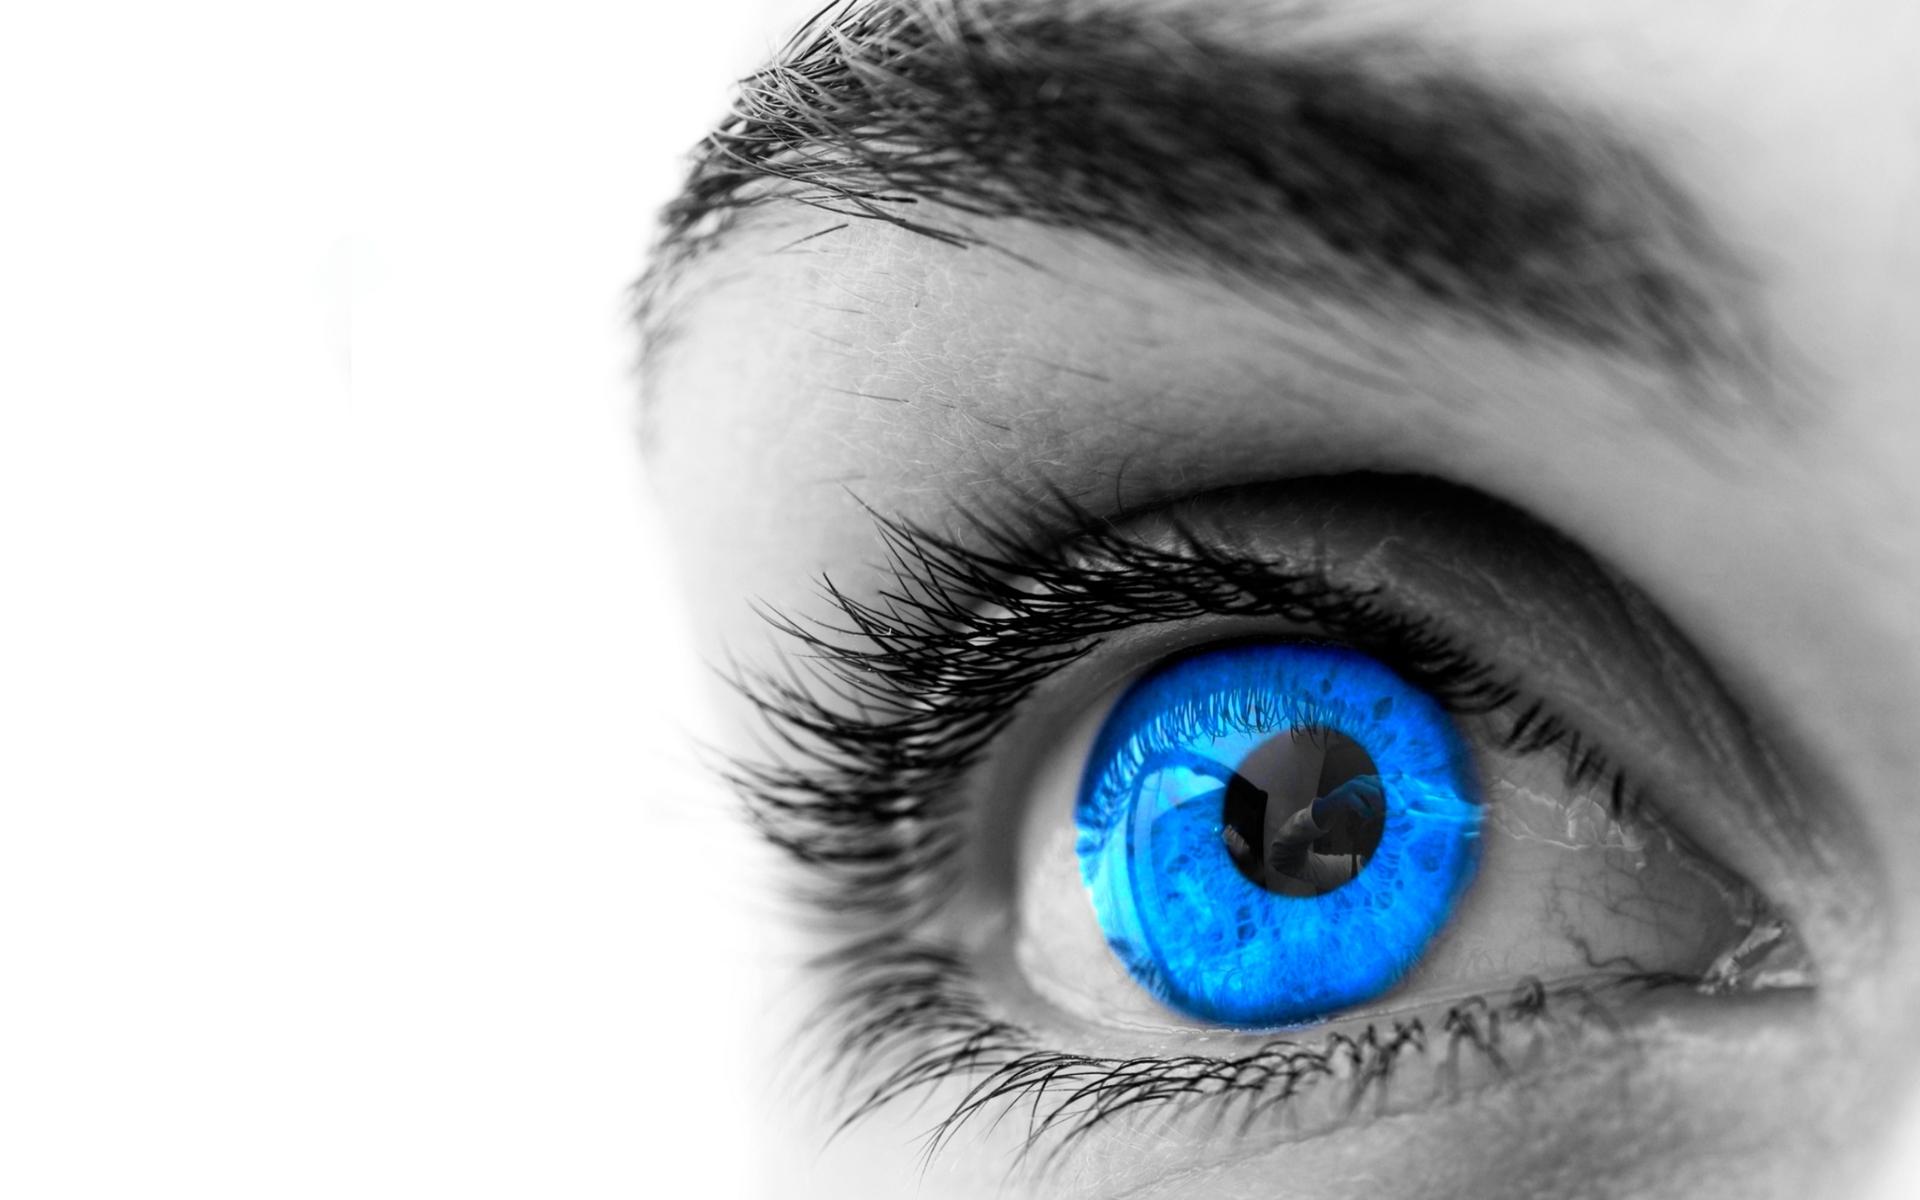 Cool Eye Wallpaper 22418 1920x1200 Px HDWallSourcecom